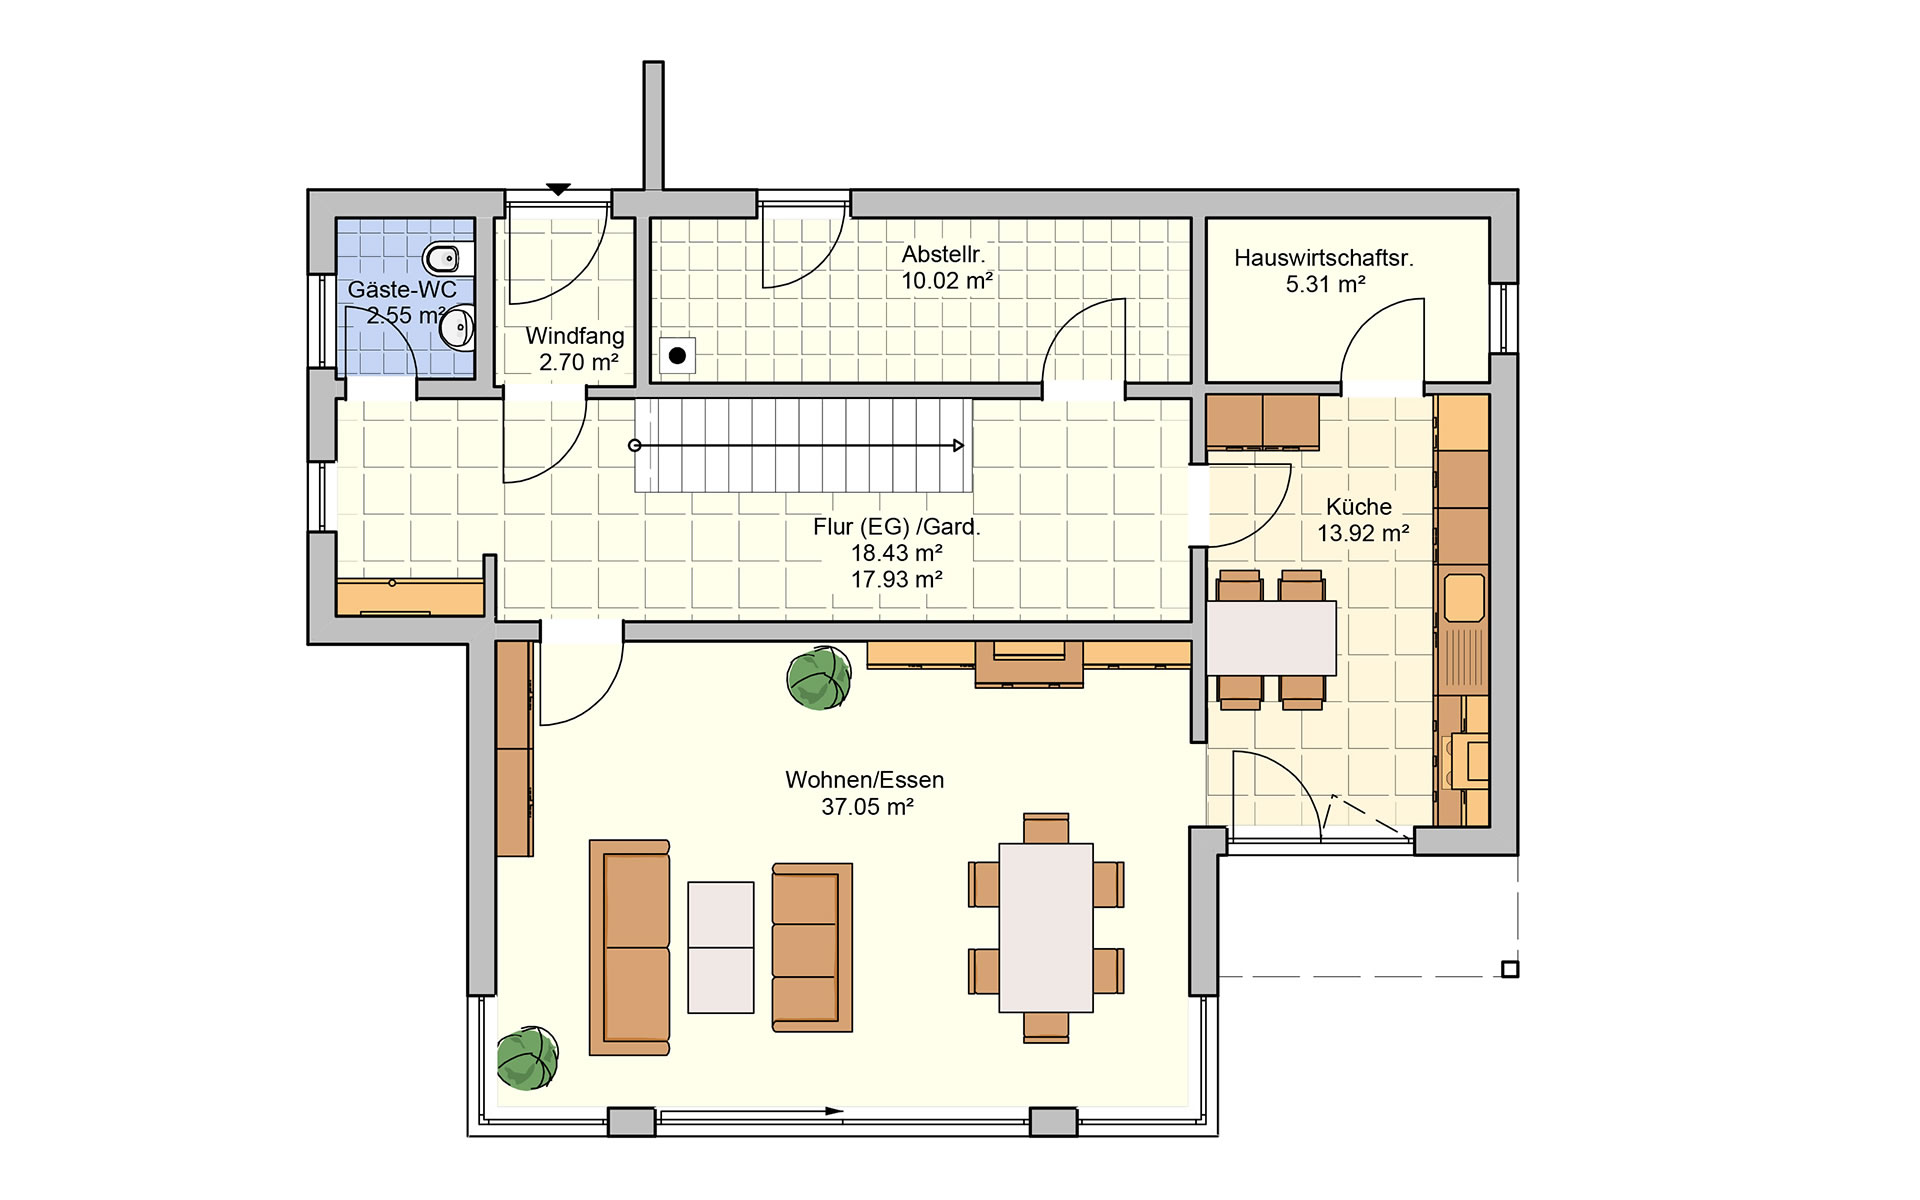 Erdgeschoss Linea von Fingerhut Haus GmbH & Co. KG